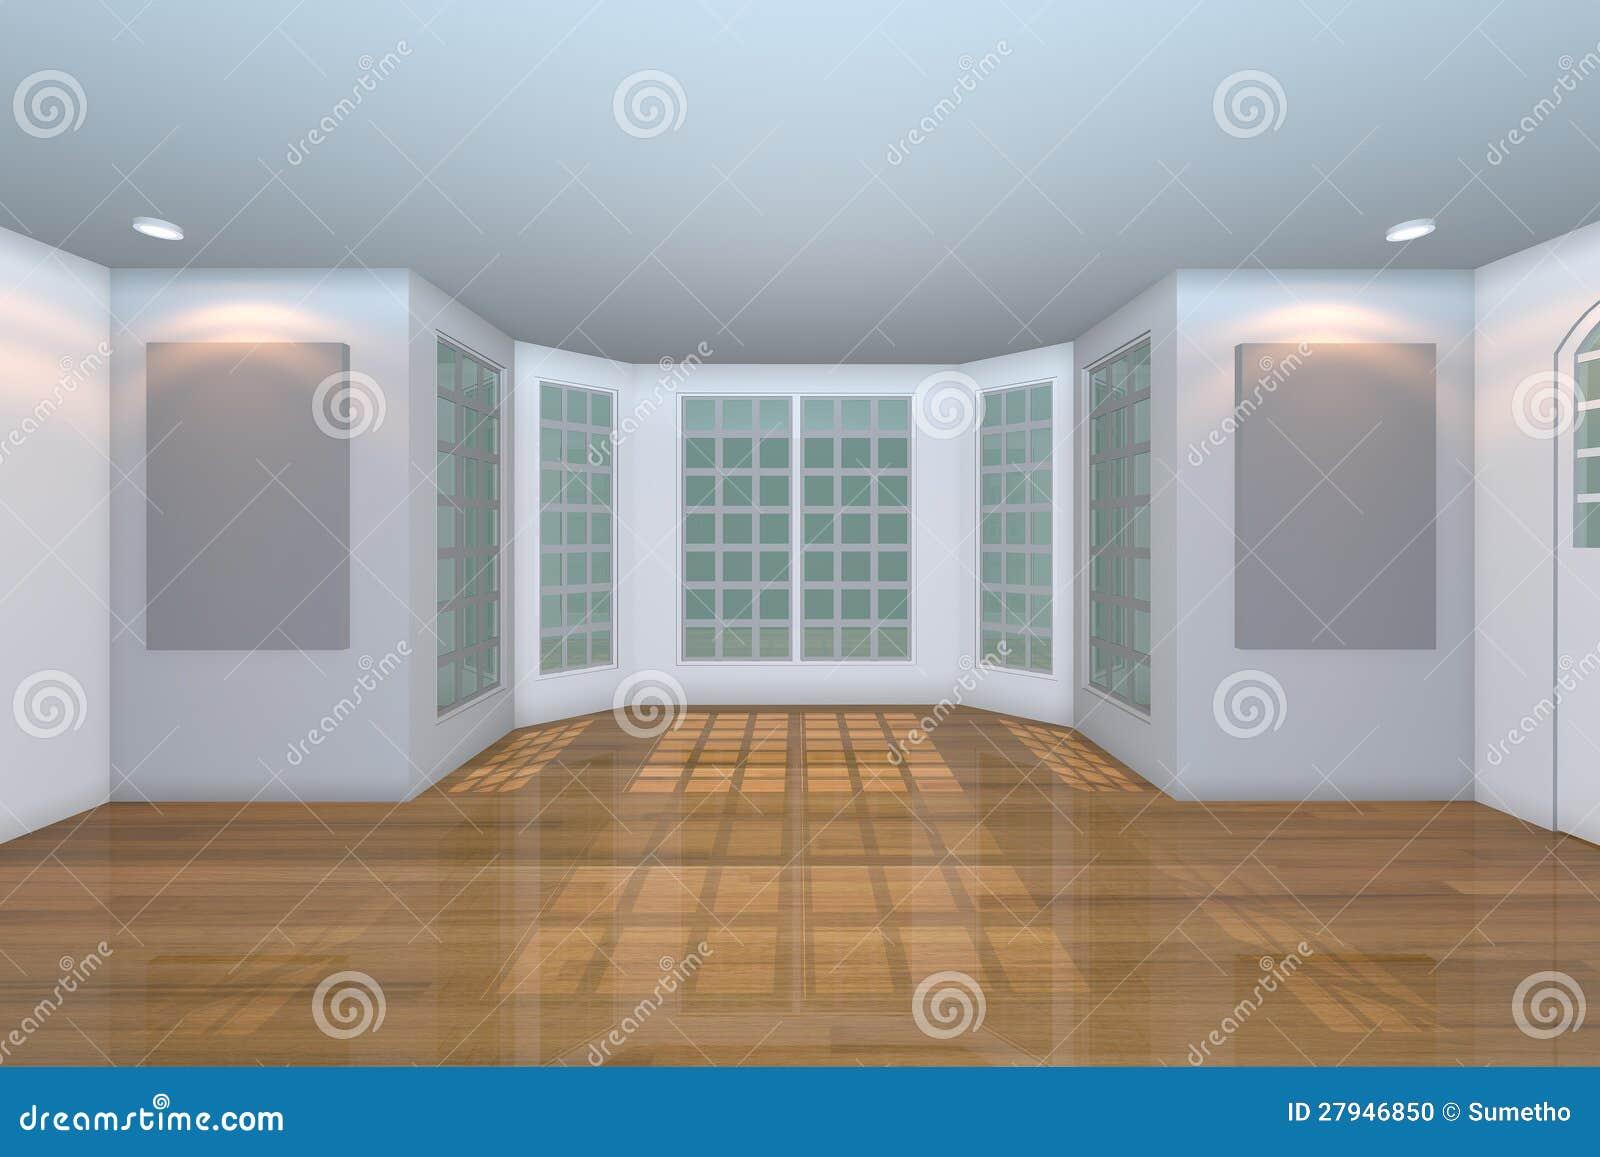 Lege Witte Woonkamer Stock Foto - Afbeelding: 27946850